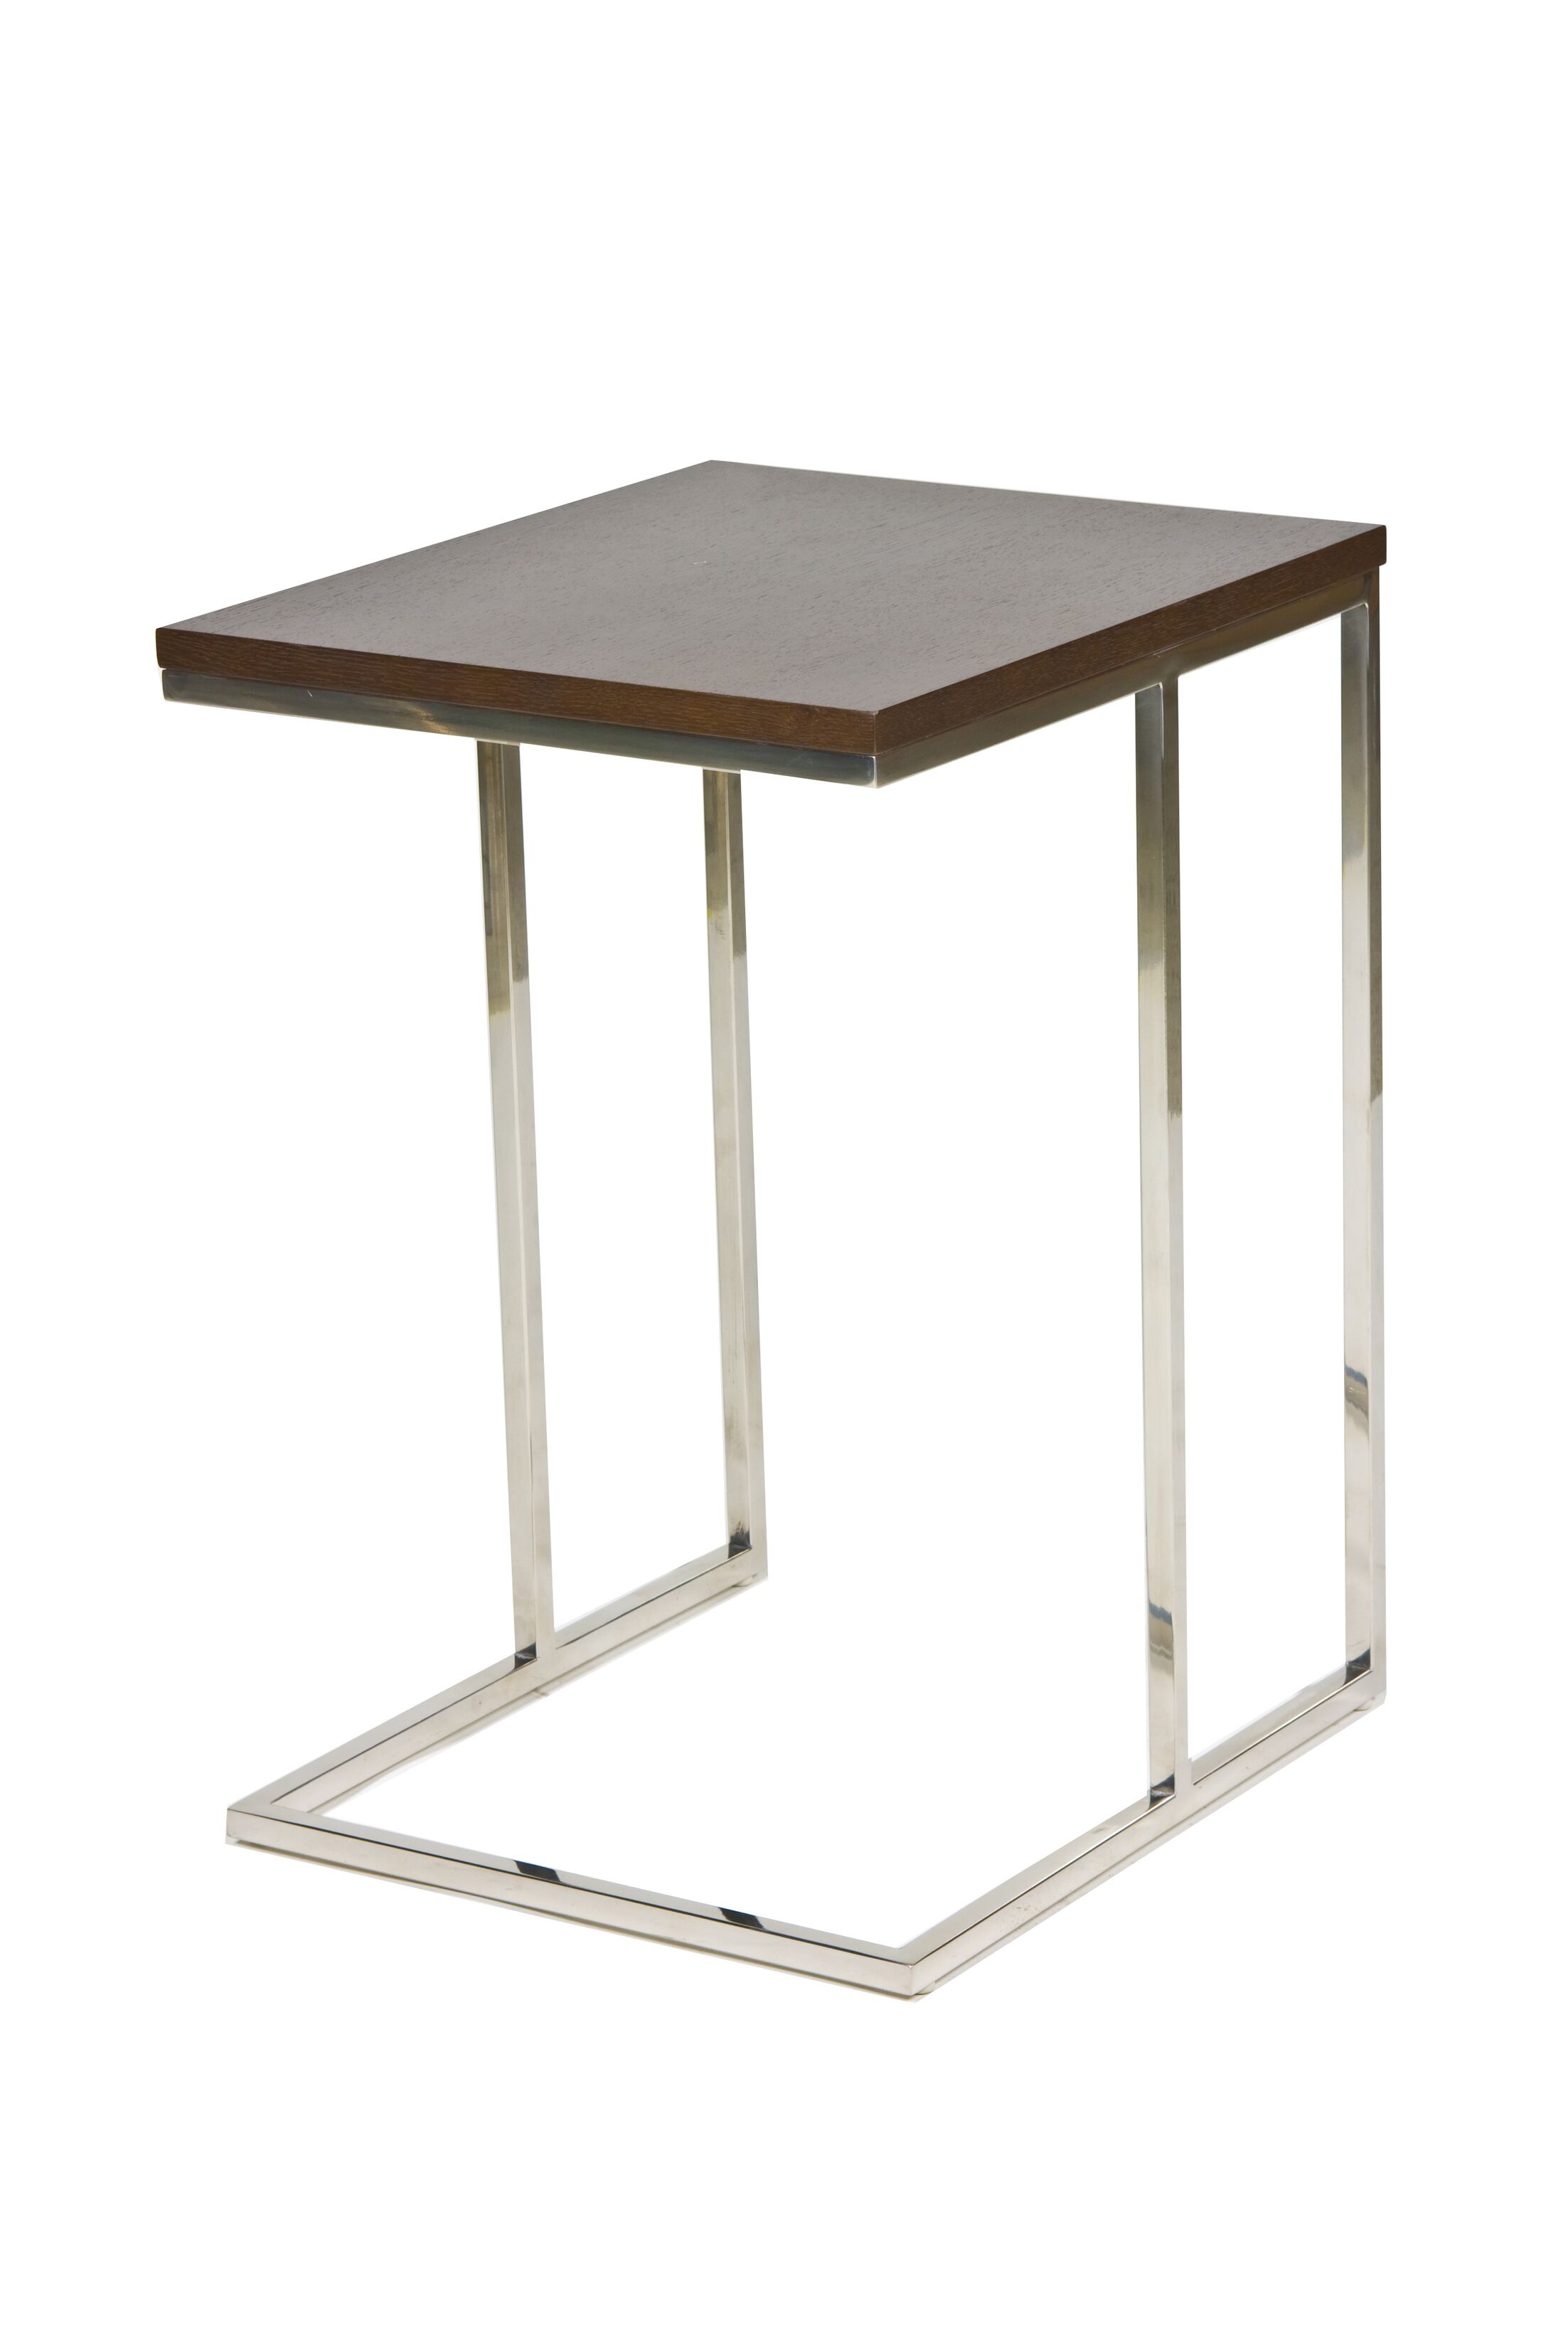 Cashin End Table Table Base Color: Silver, Table Top Color: Espresso